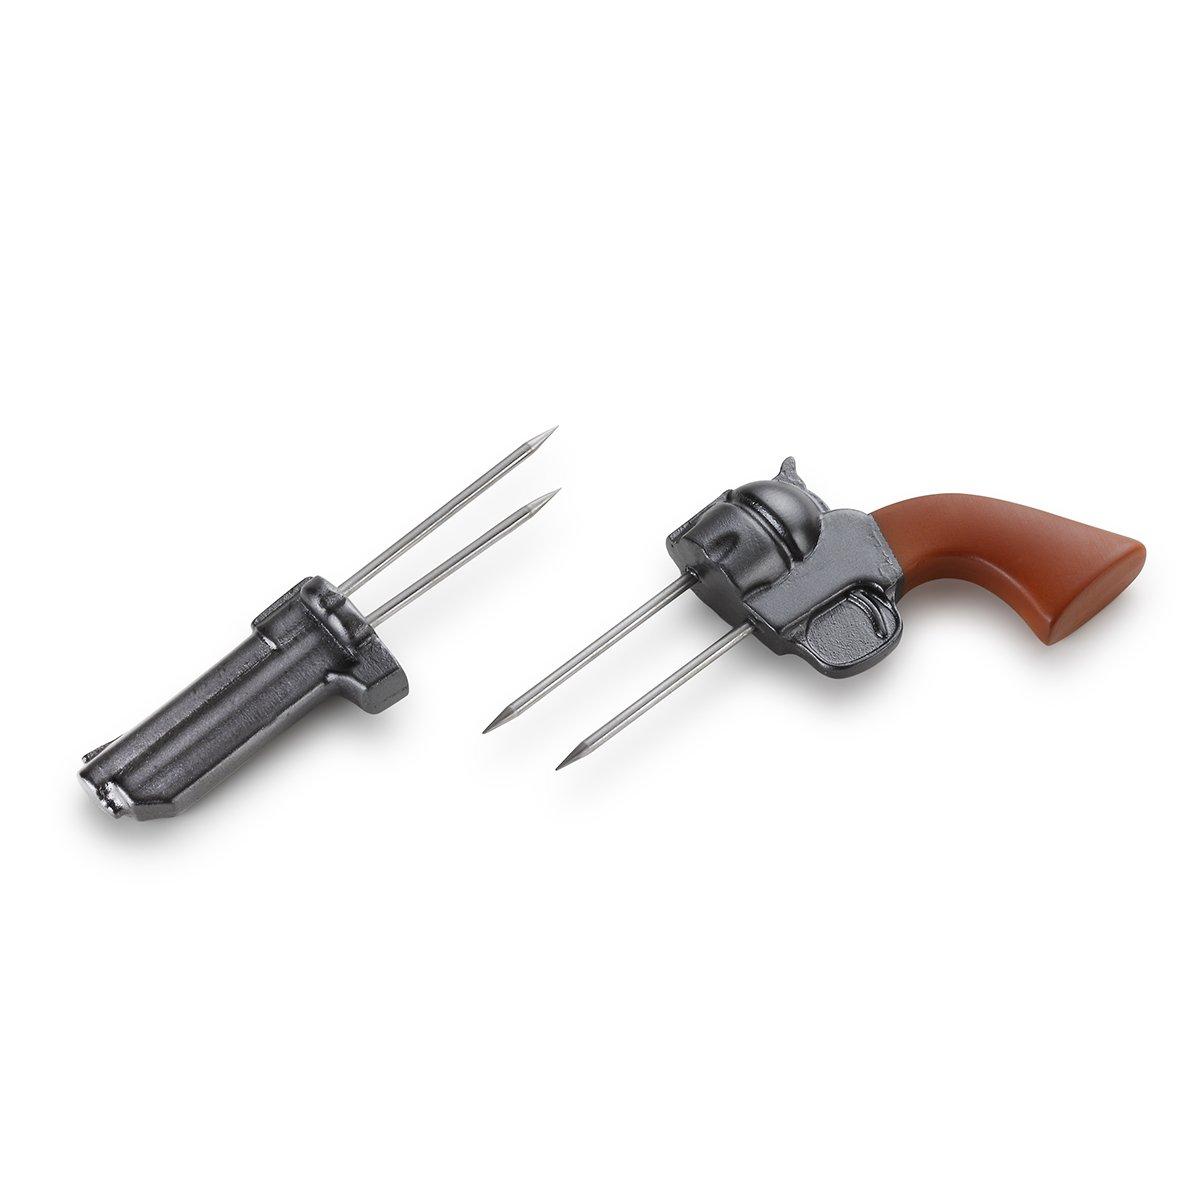 Demdaco 3005051124 Big Sky Carvers Revolver Corn Holders Set, Multicolored